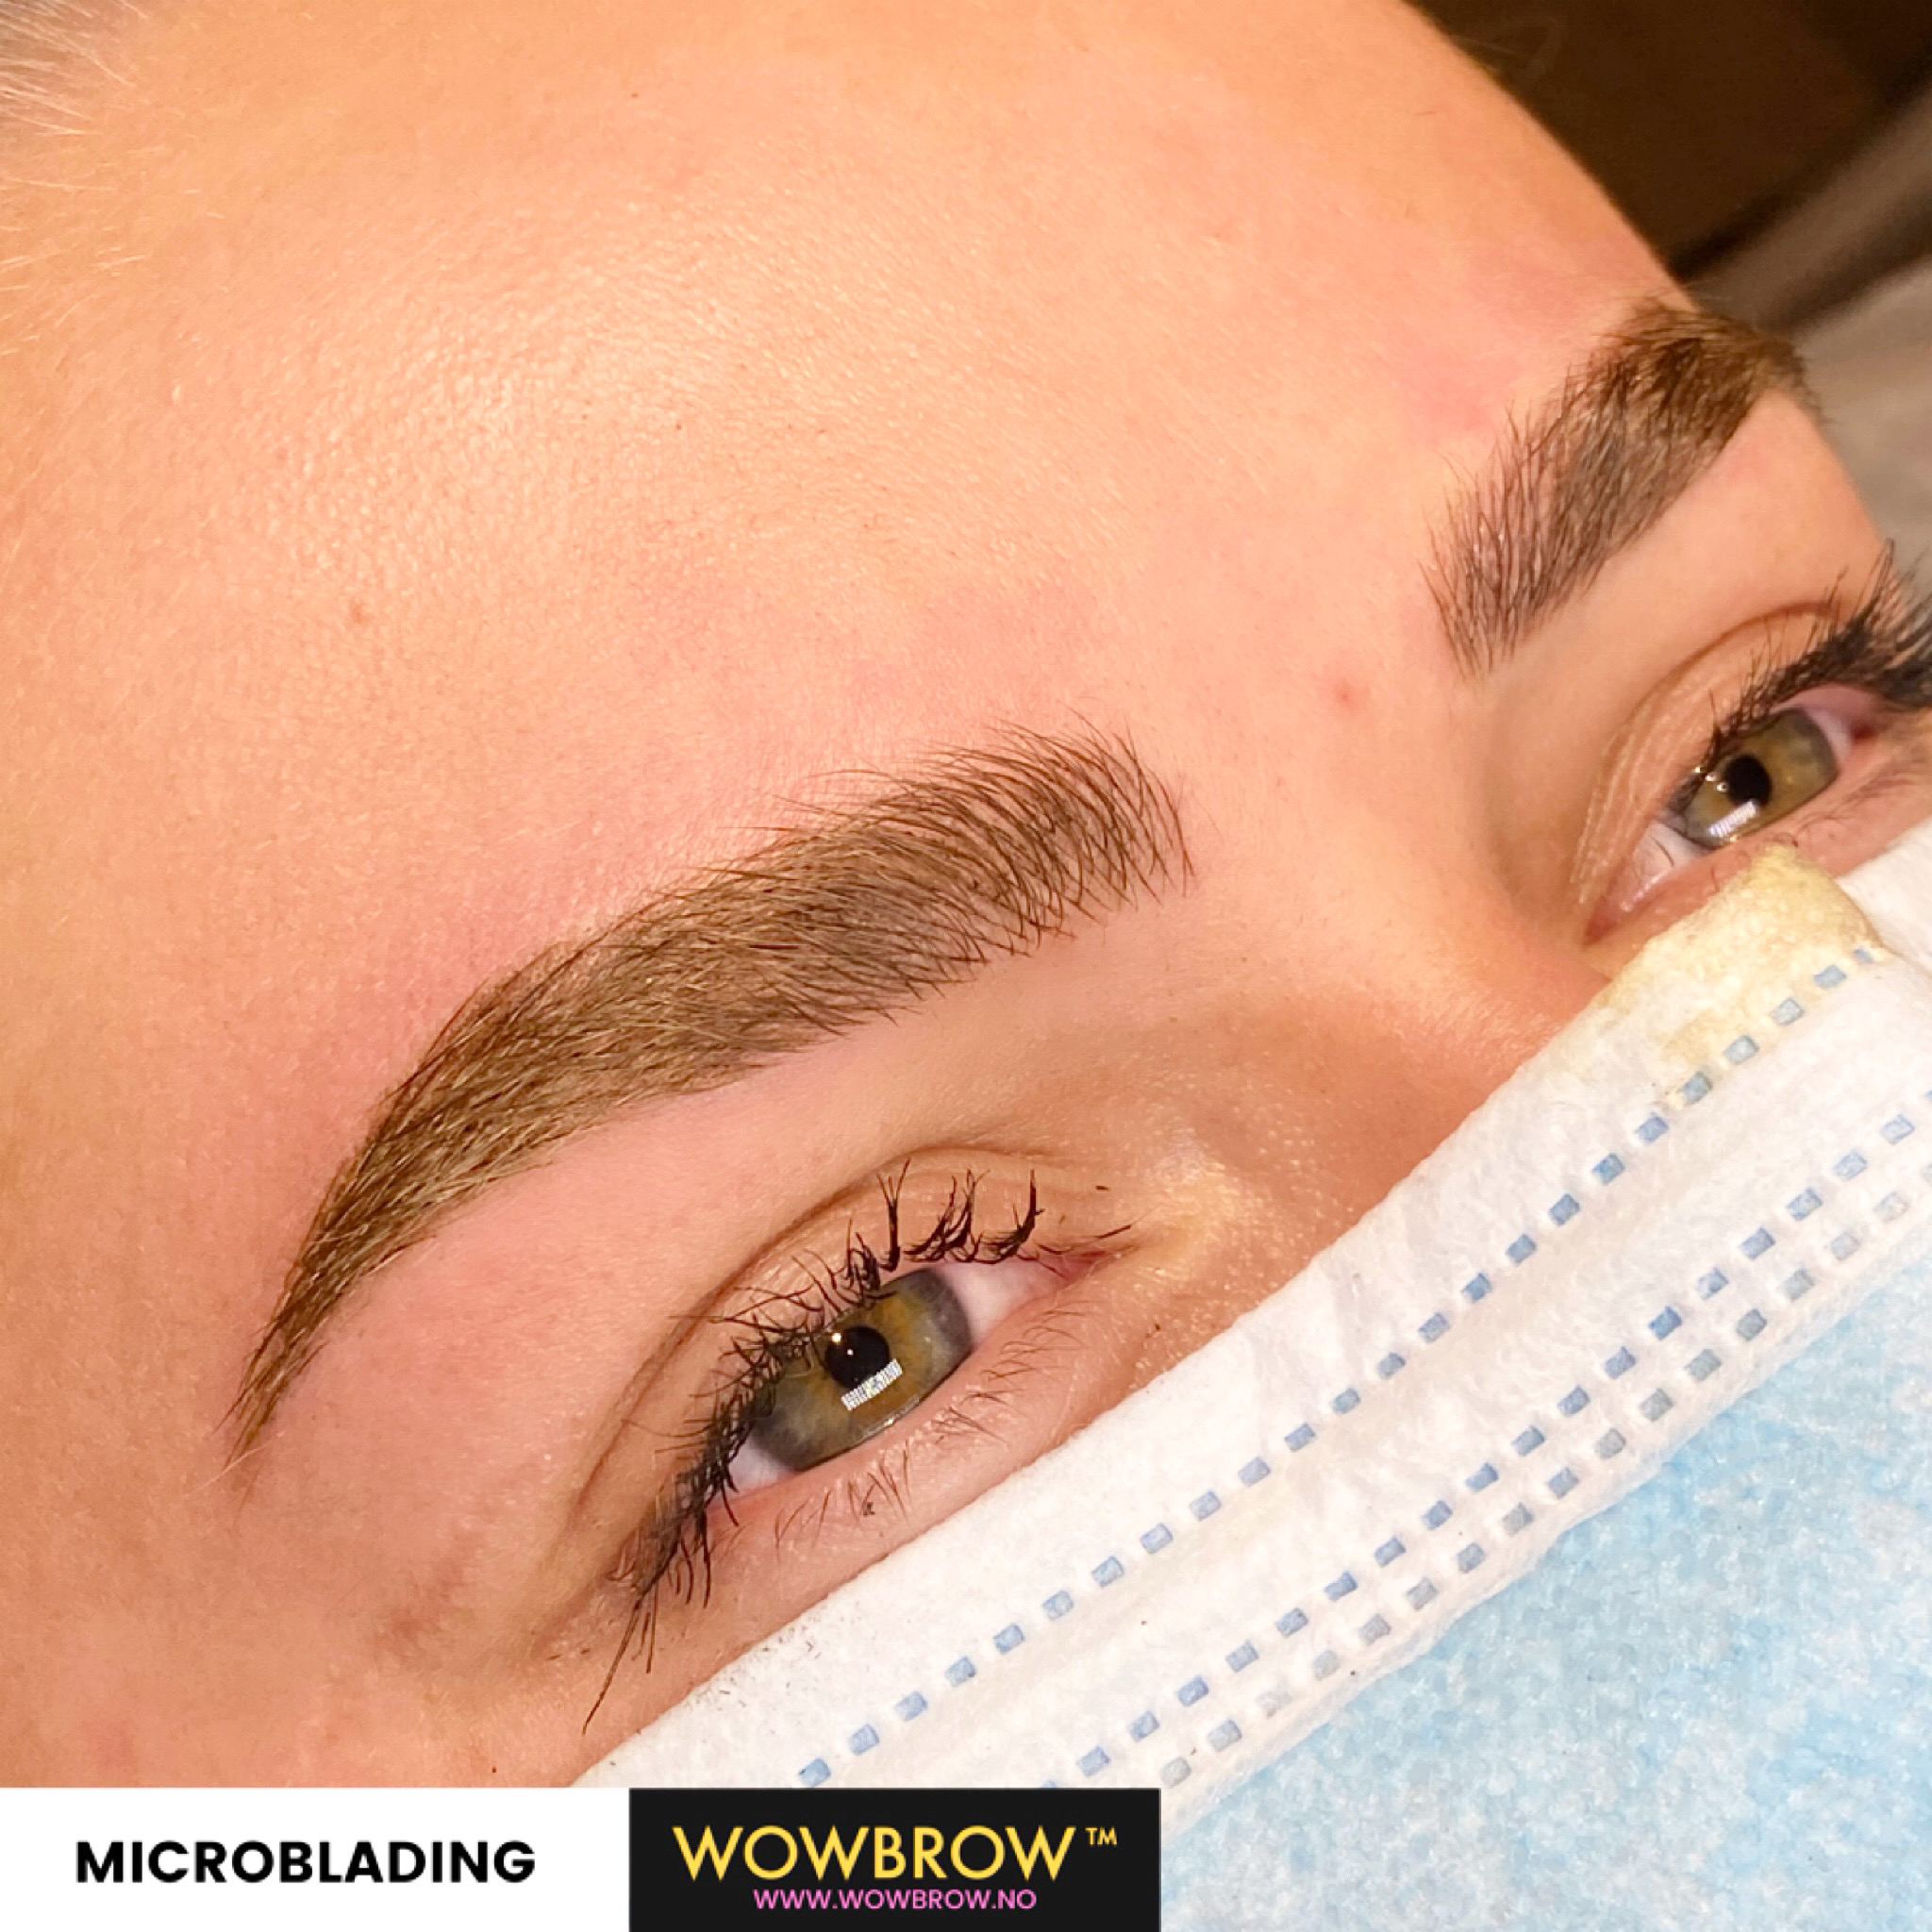 microblading wowbrow